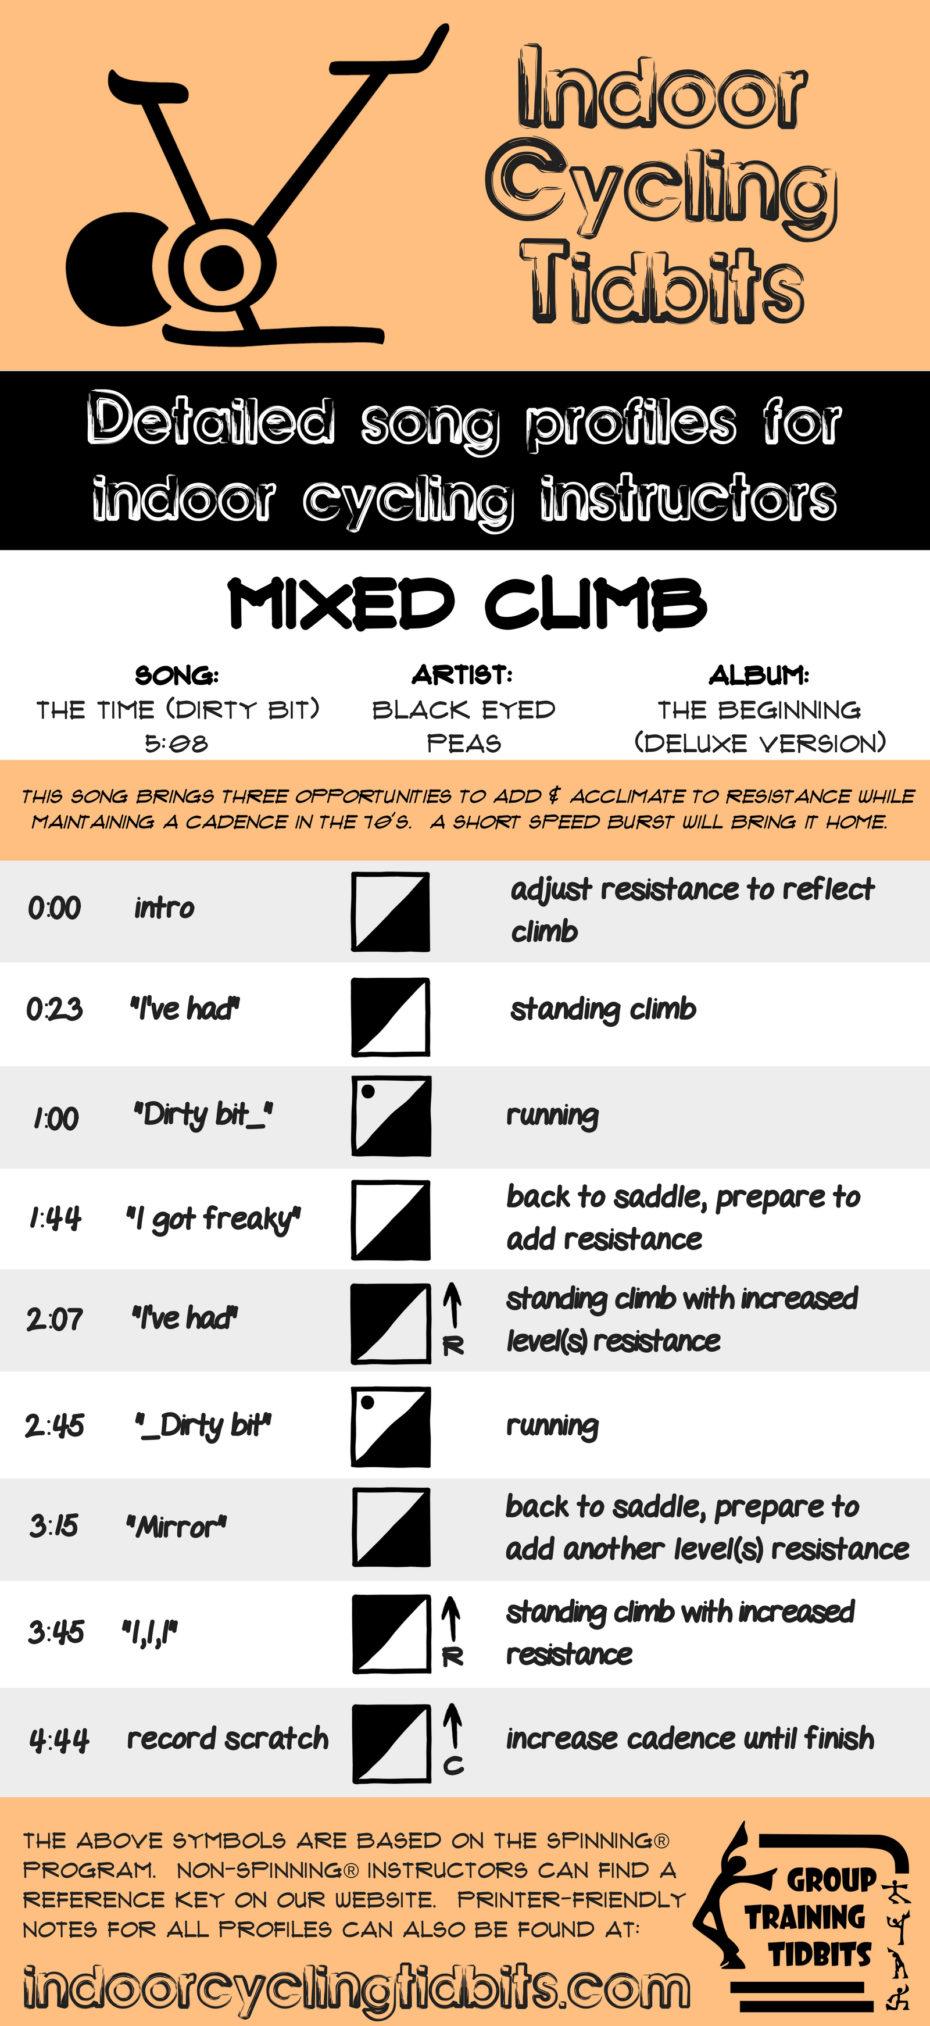 Spinning song ideas for climbs Dirty Bit